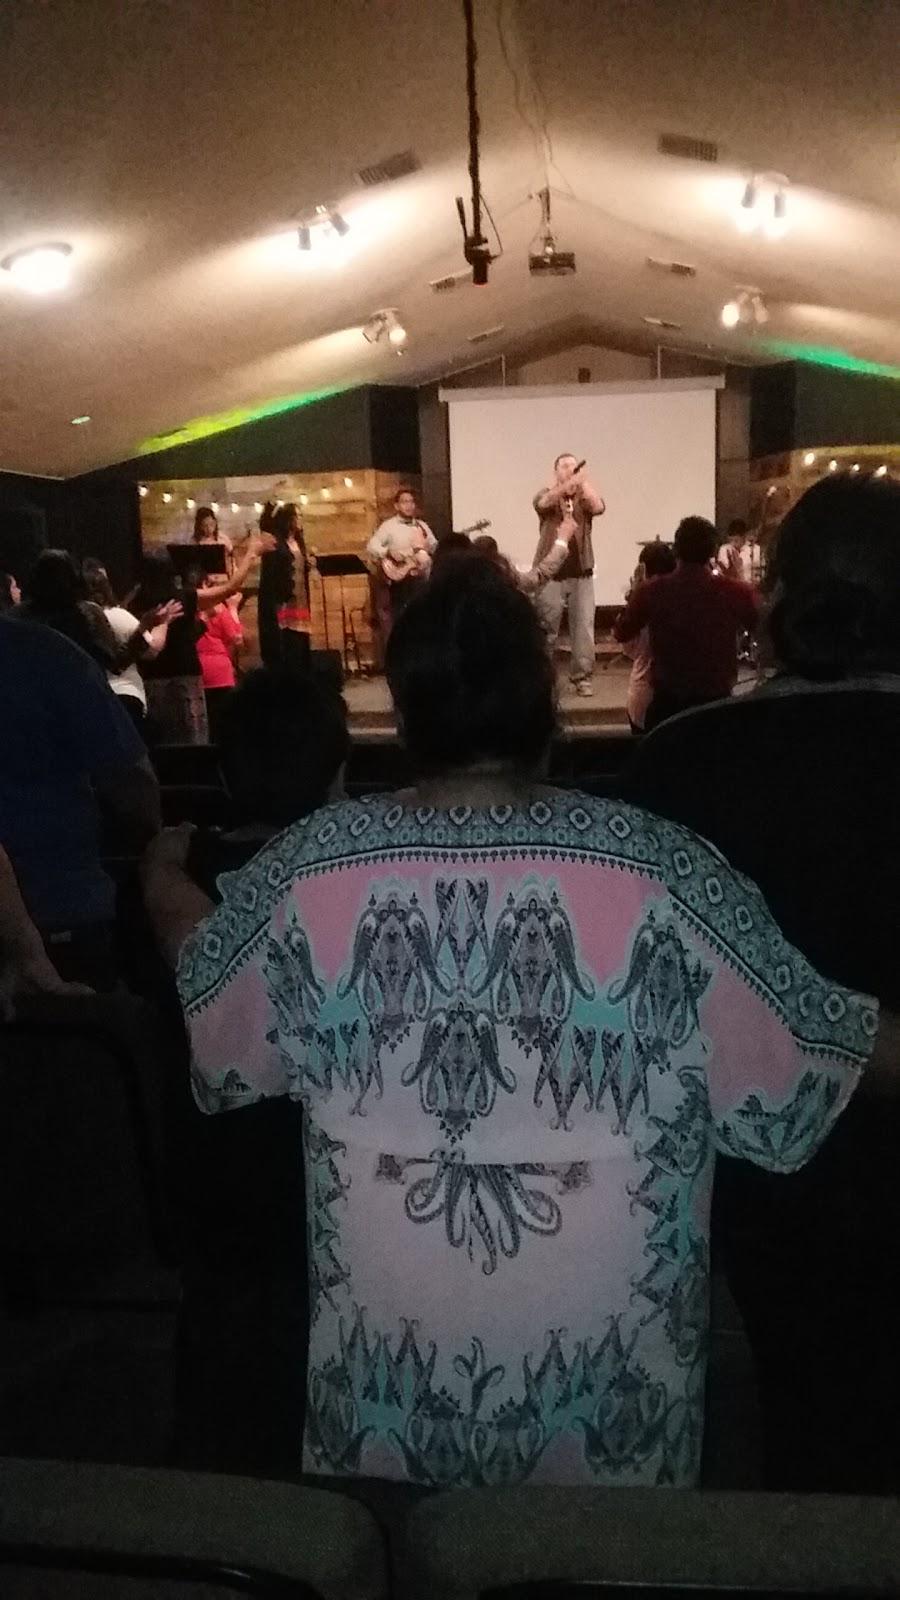 Mt. Zion Revival Center - church  | Photo 3 of 7 | Address: 2106 Jones Rd, Beeville, TX 78102, USA | Phone: (361) 343-5622